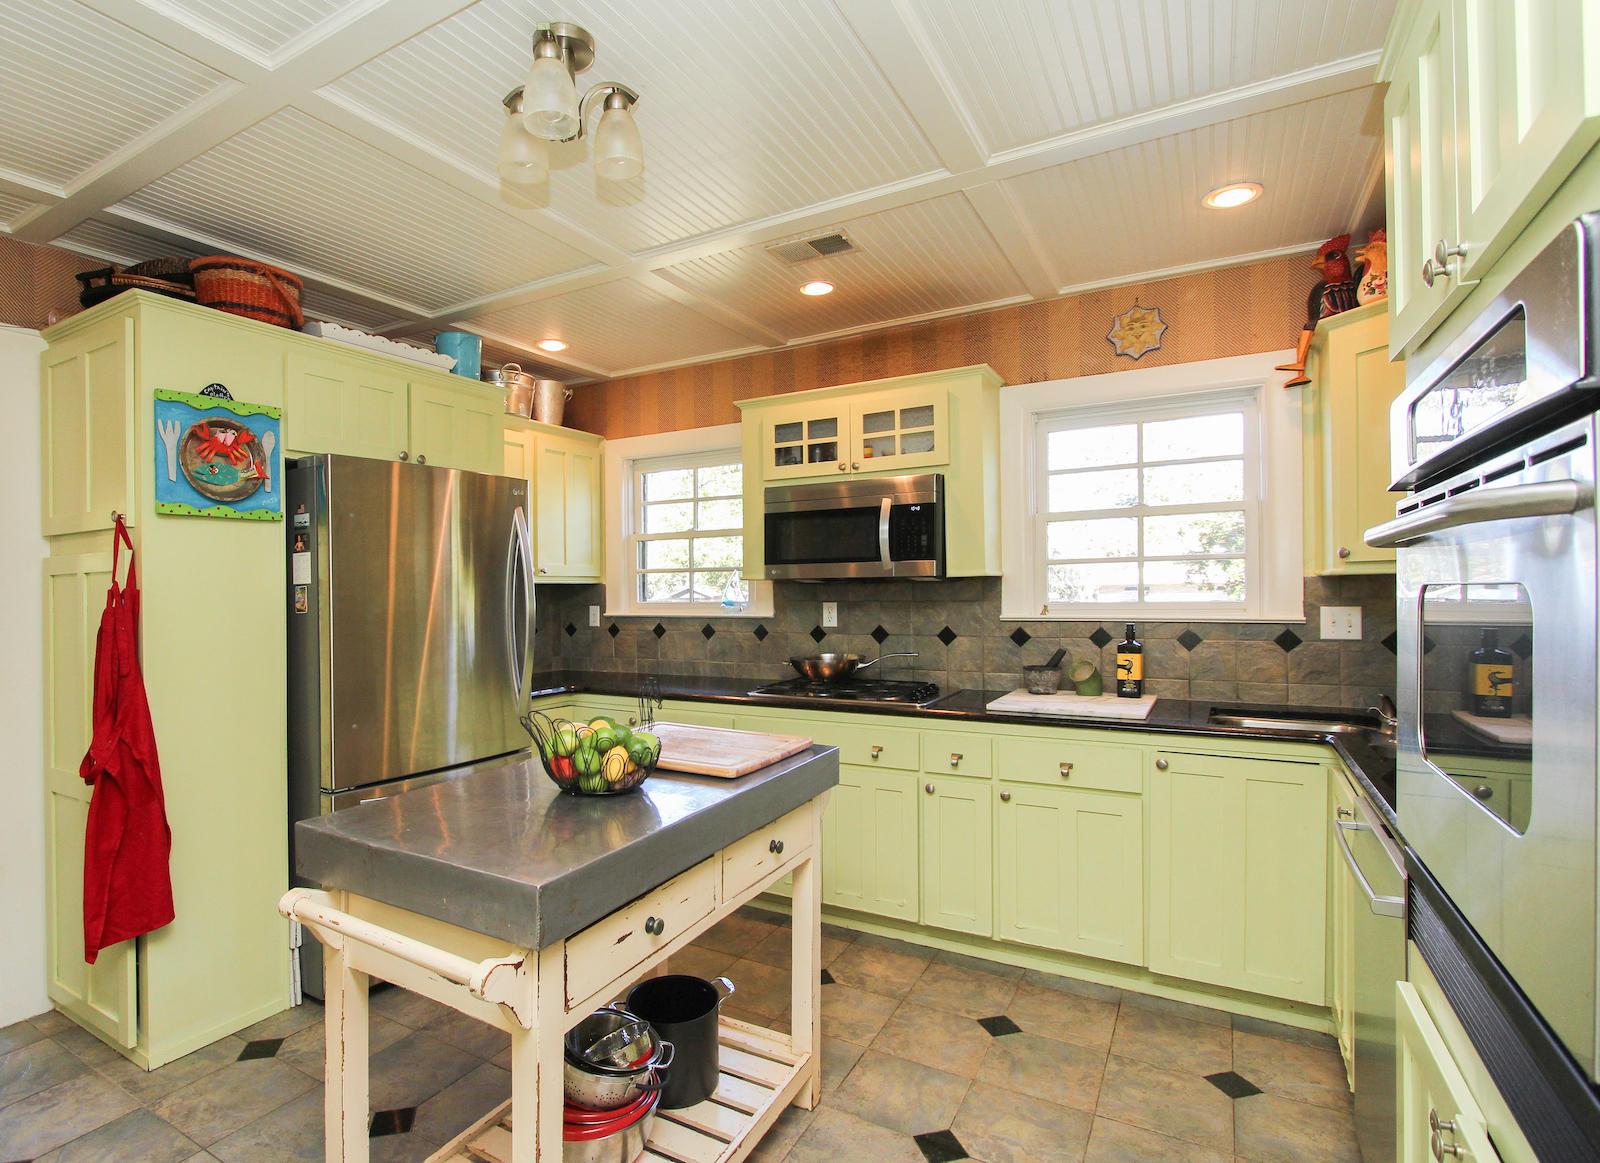 Albemarle Point Homes For Sale - 3 Albemarle, Charleston, SC - 4